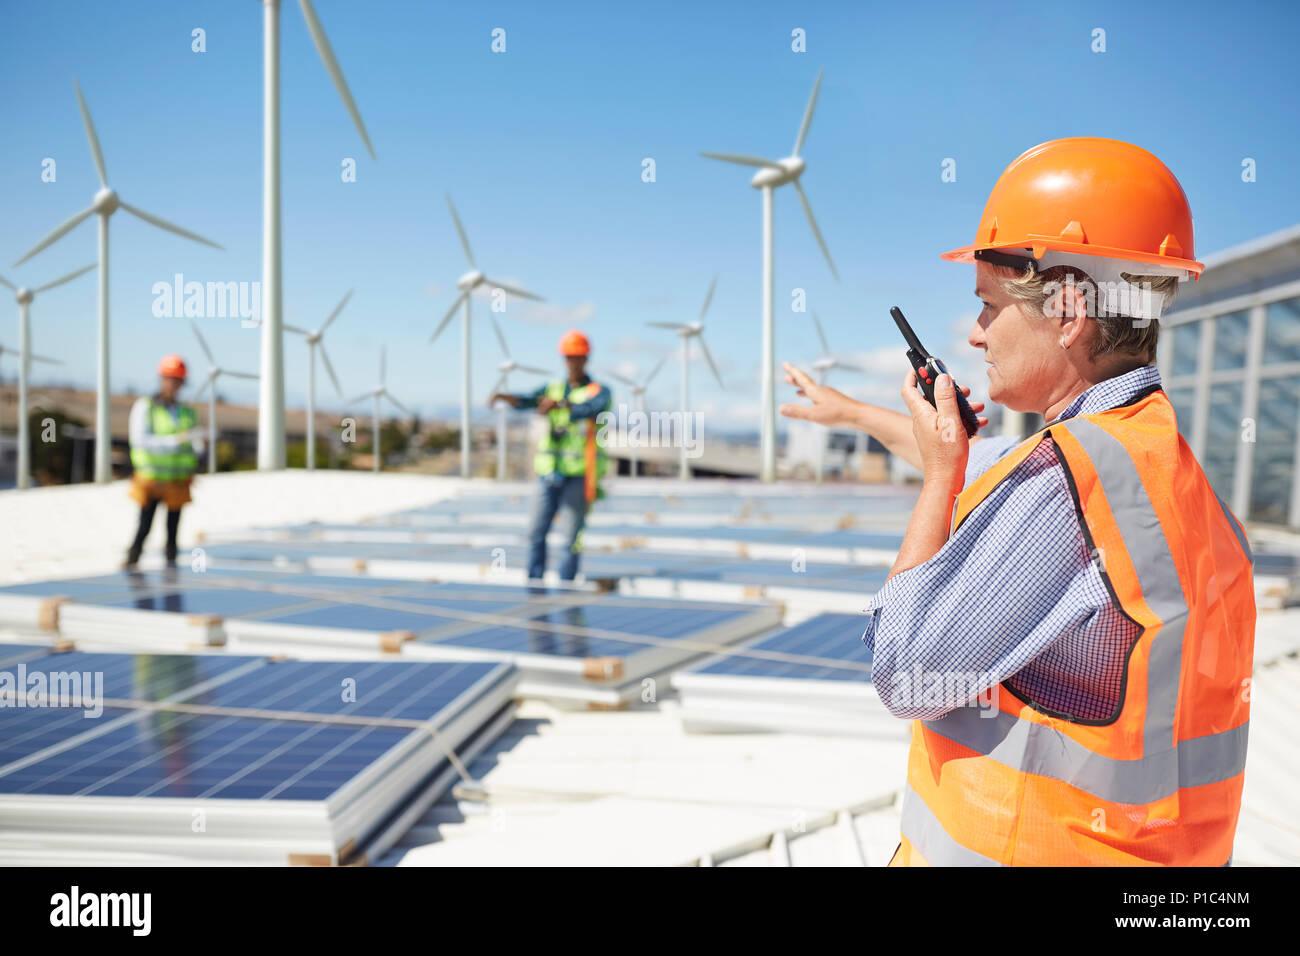 Female engineer using walkie-talkie at alternative energy power plant - Stock Image